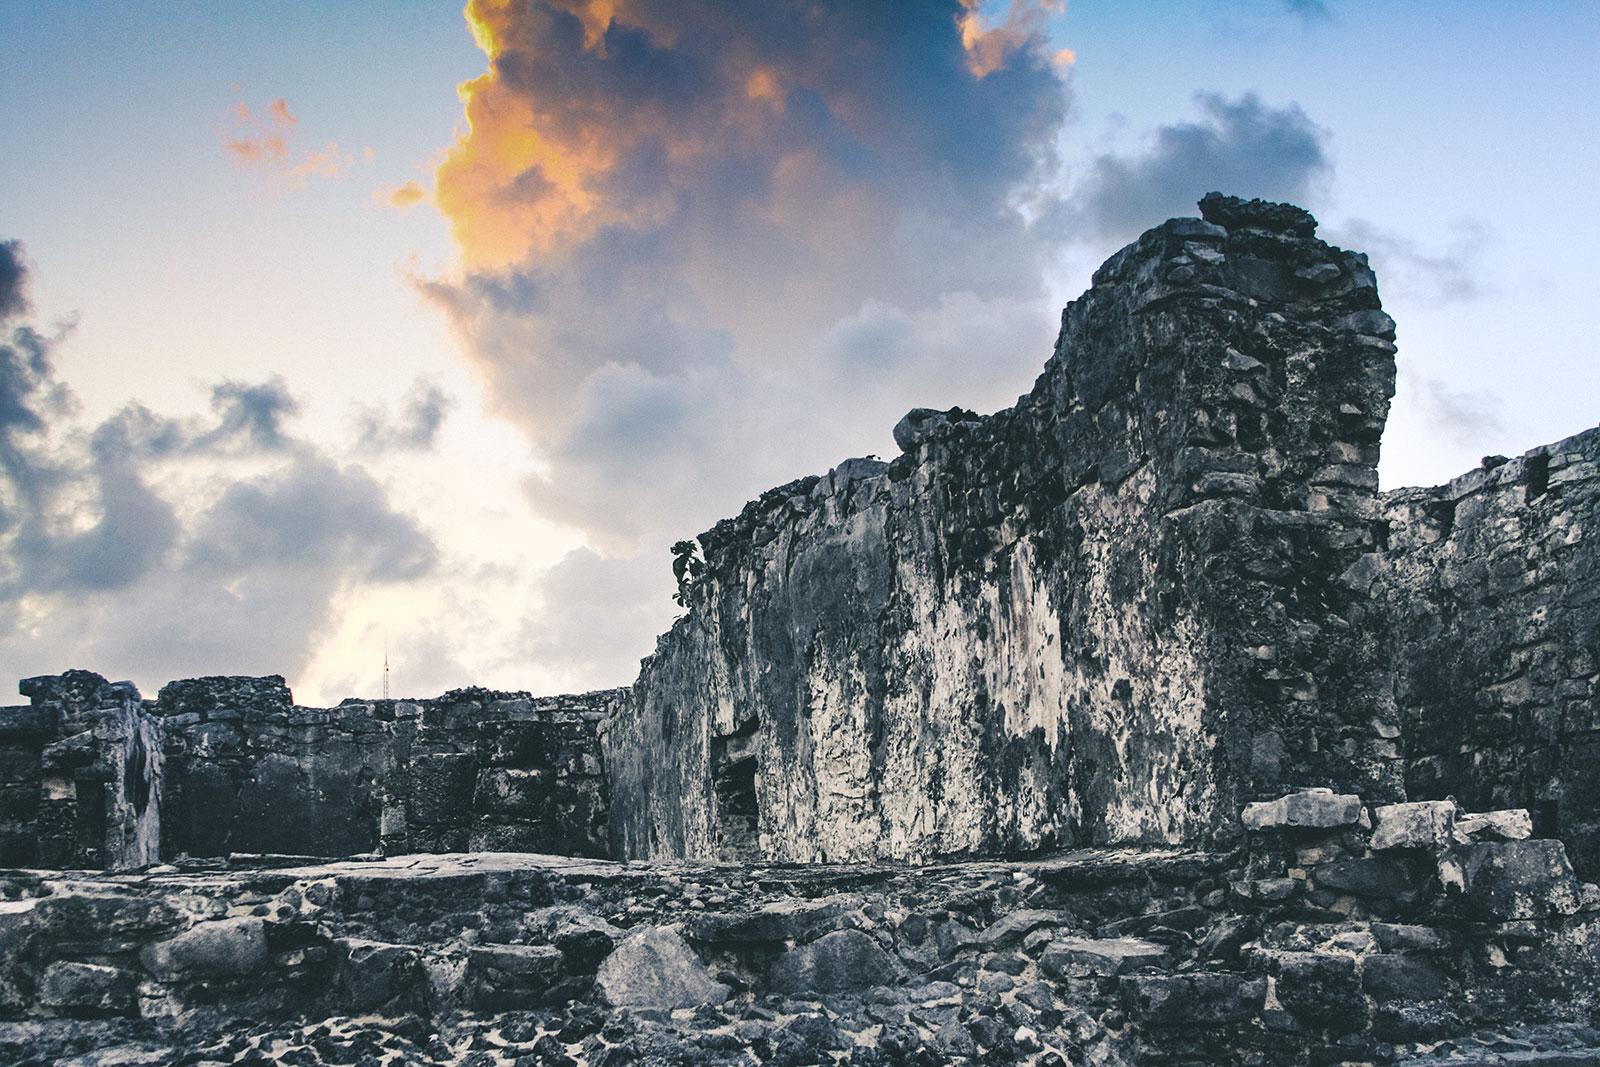 Maya_Luxe_Riviera_Maya_Luxury_Vacations_Magazine_Local_Stories_Secrets_of_the_Gods_in_Tulum_Riviera_Maya's_Only_Clifftop_Ruin_19.jpg